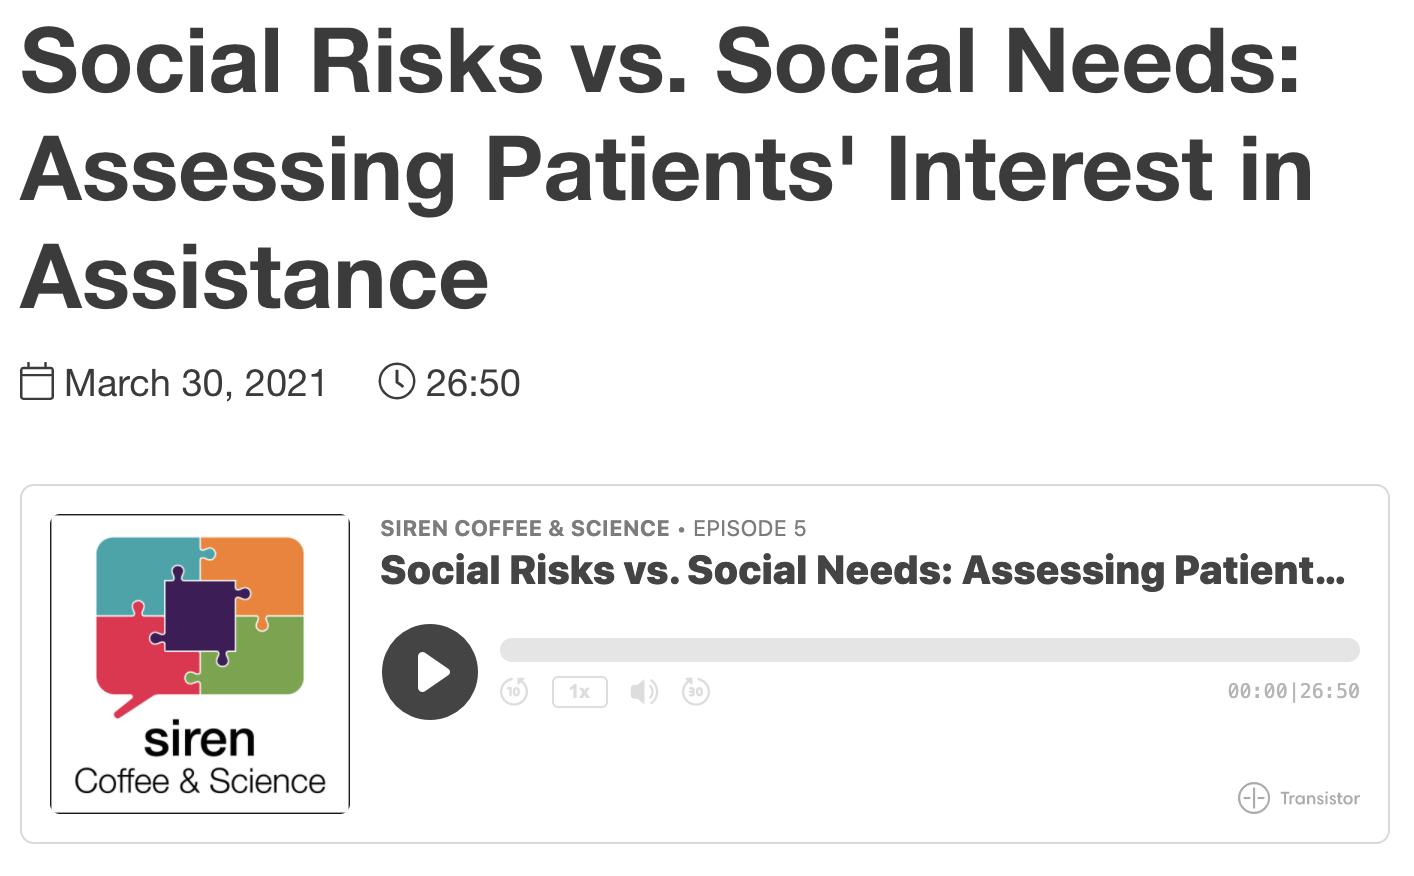 Social Risks vs. Social Needs: Assessing Patients' Interest in Assistance